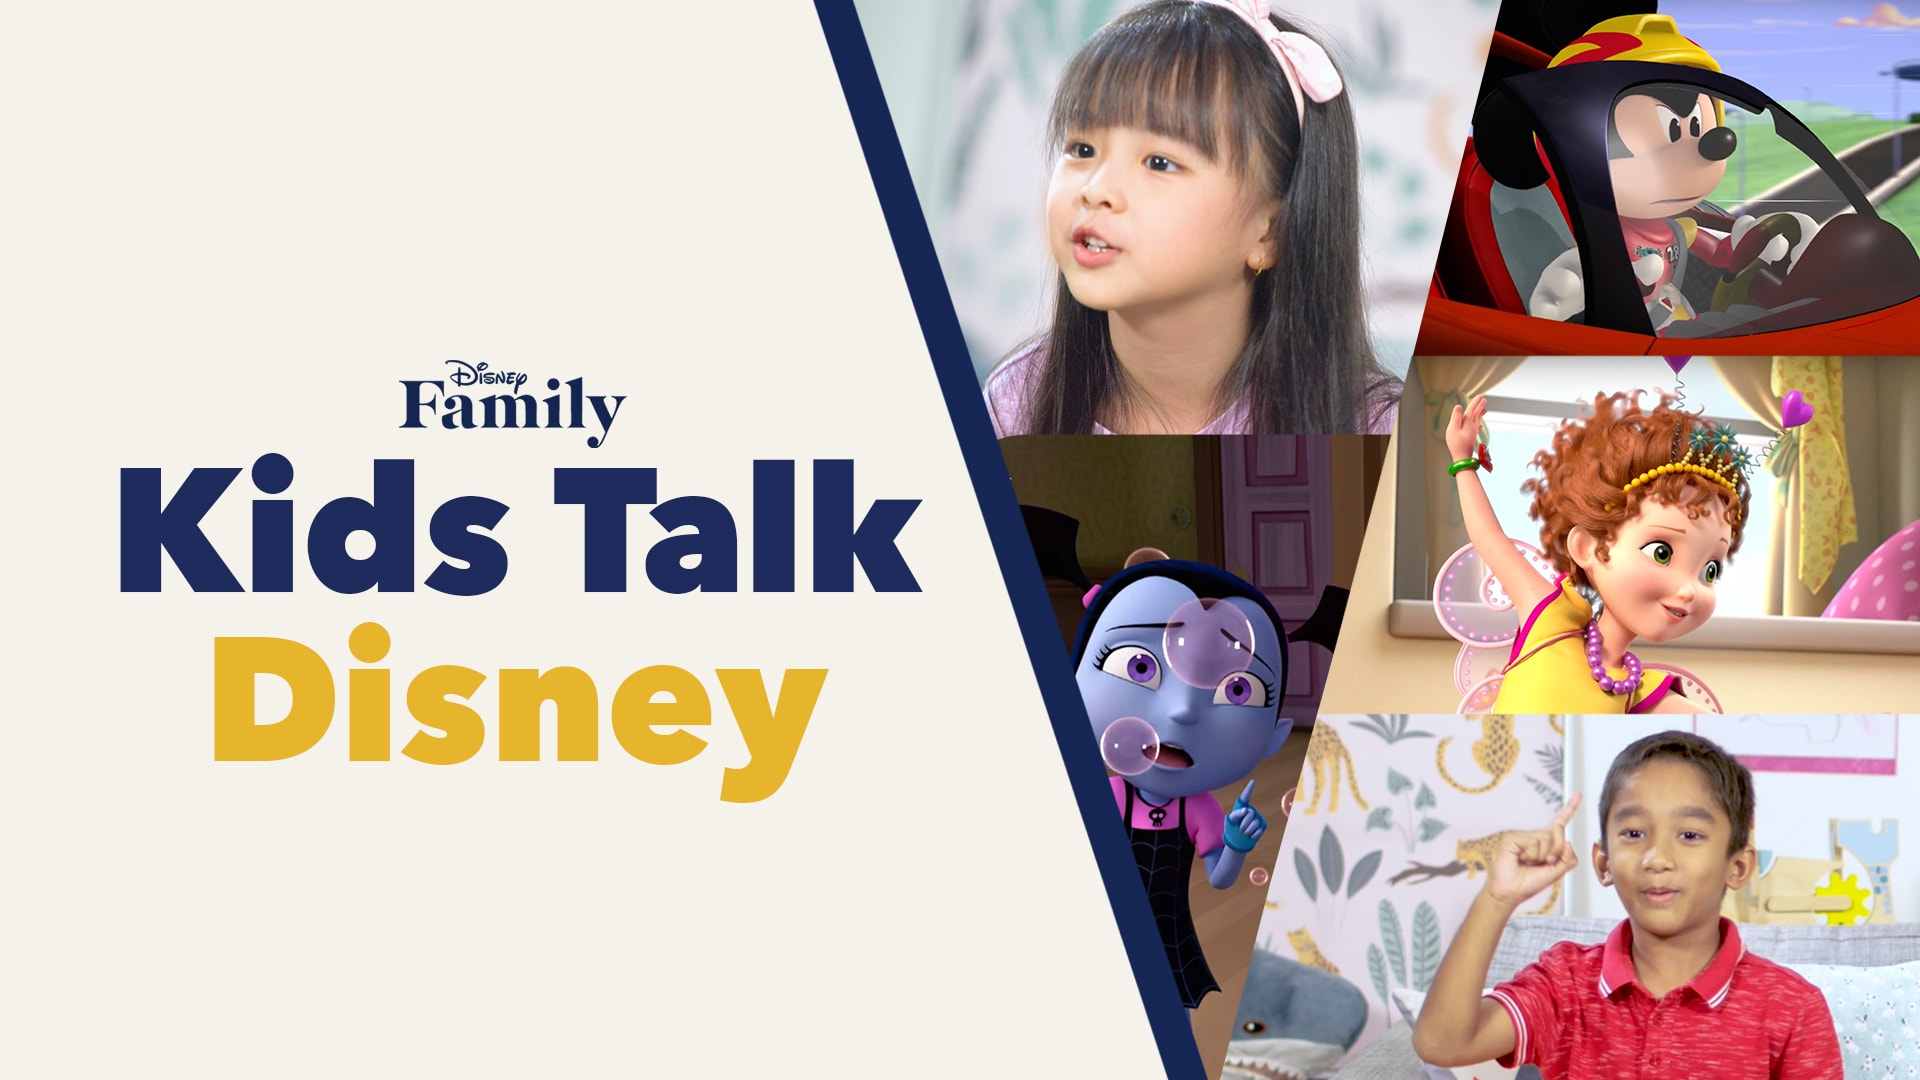 KIDS TALK DISNEY: เมื่อโตขึ้น หนูอยากเป็น…?